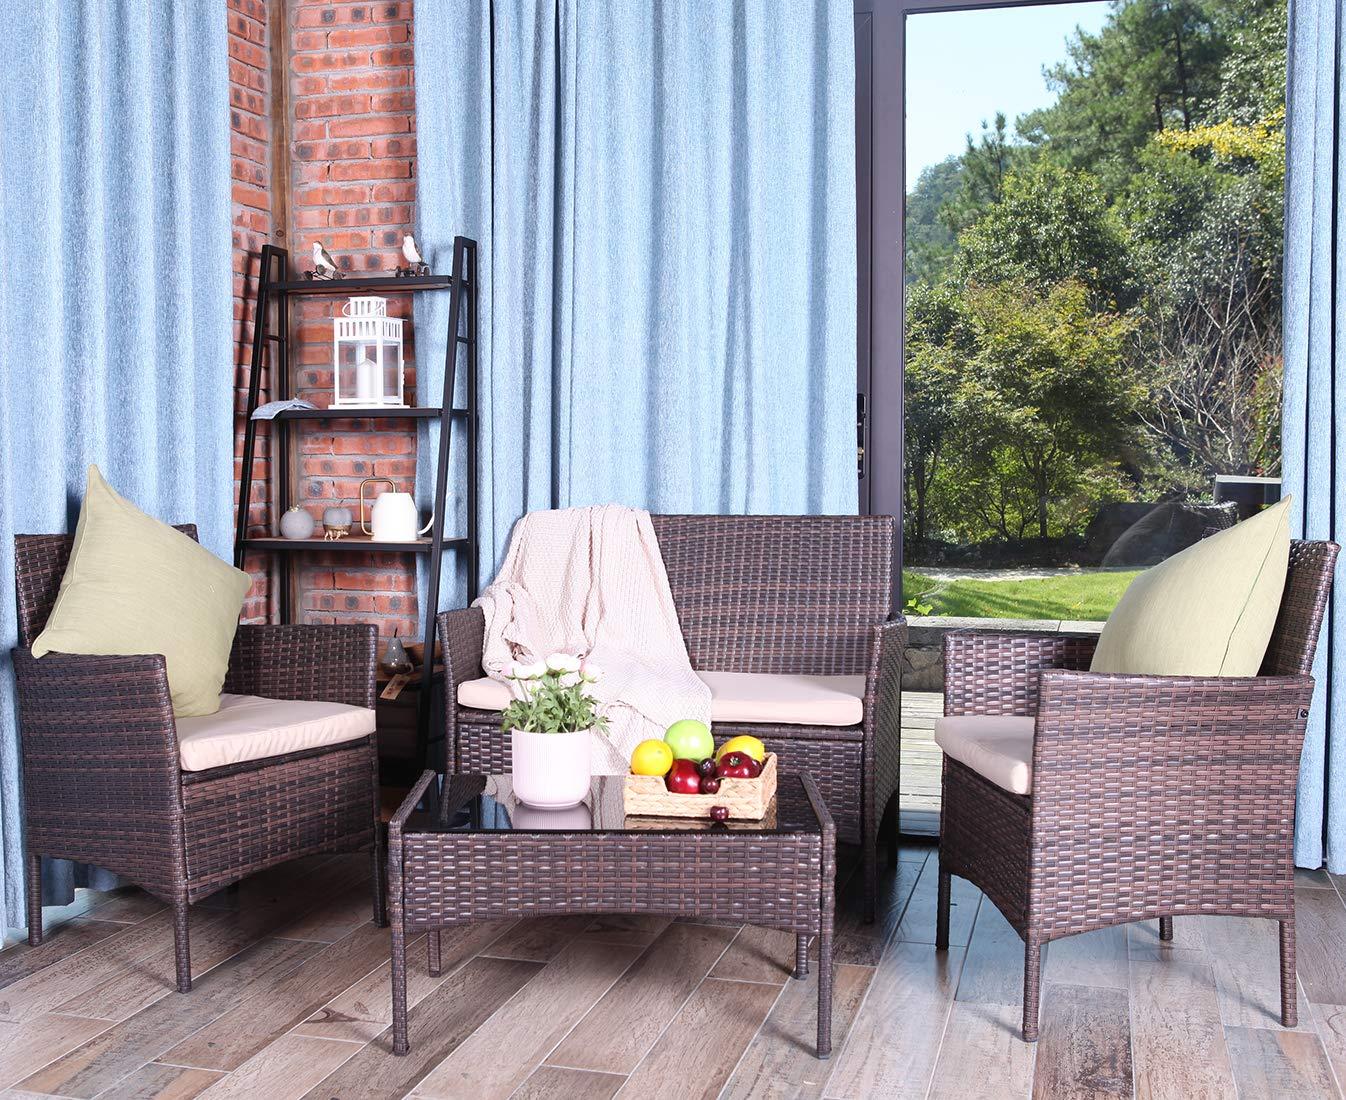 UFI 4PCS Outdoor Patio Furniture Sets Rattan Chair Wicker Set, Use Backyard Porch Garden Poolside Balcony RTA Furniture, Brown